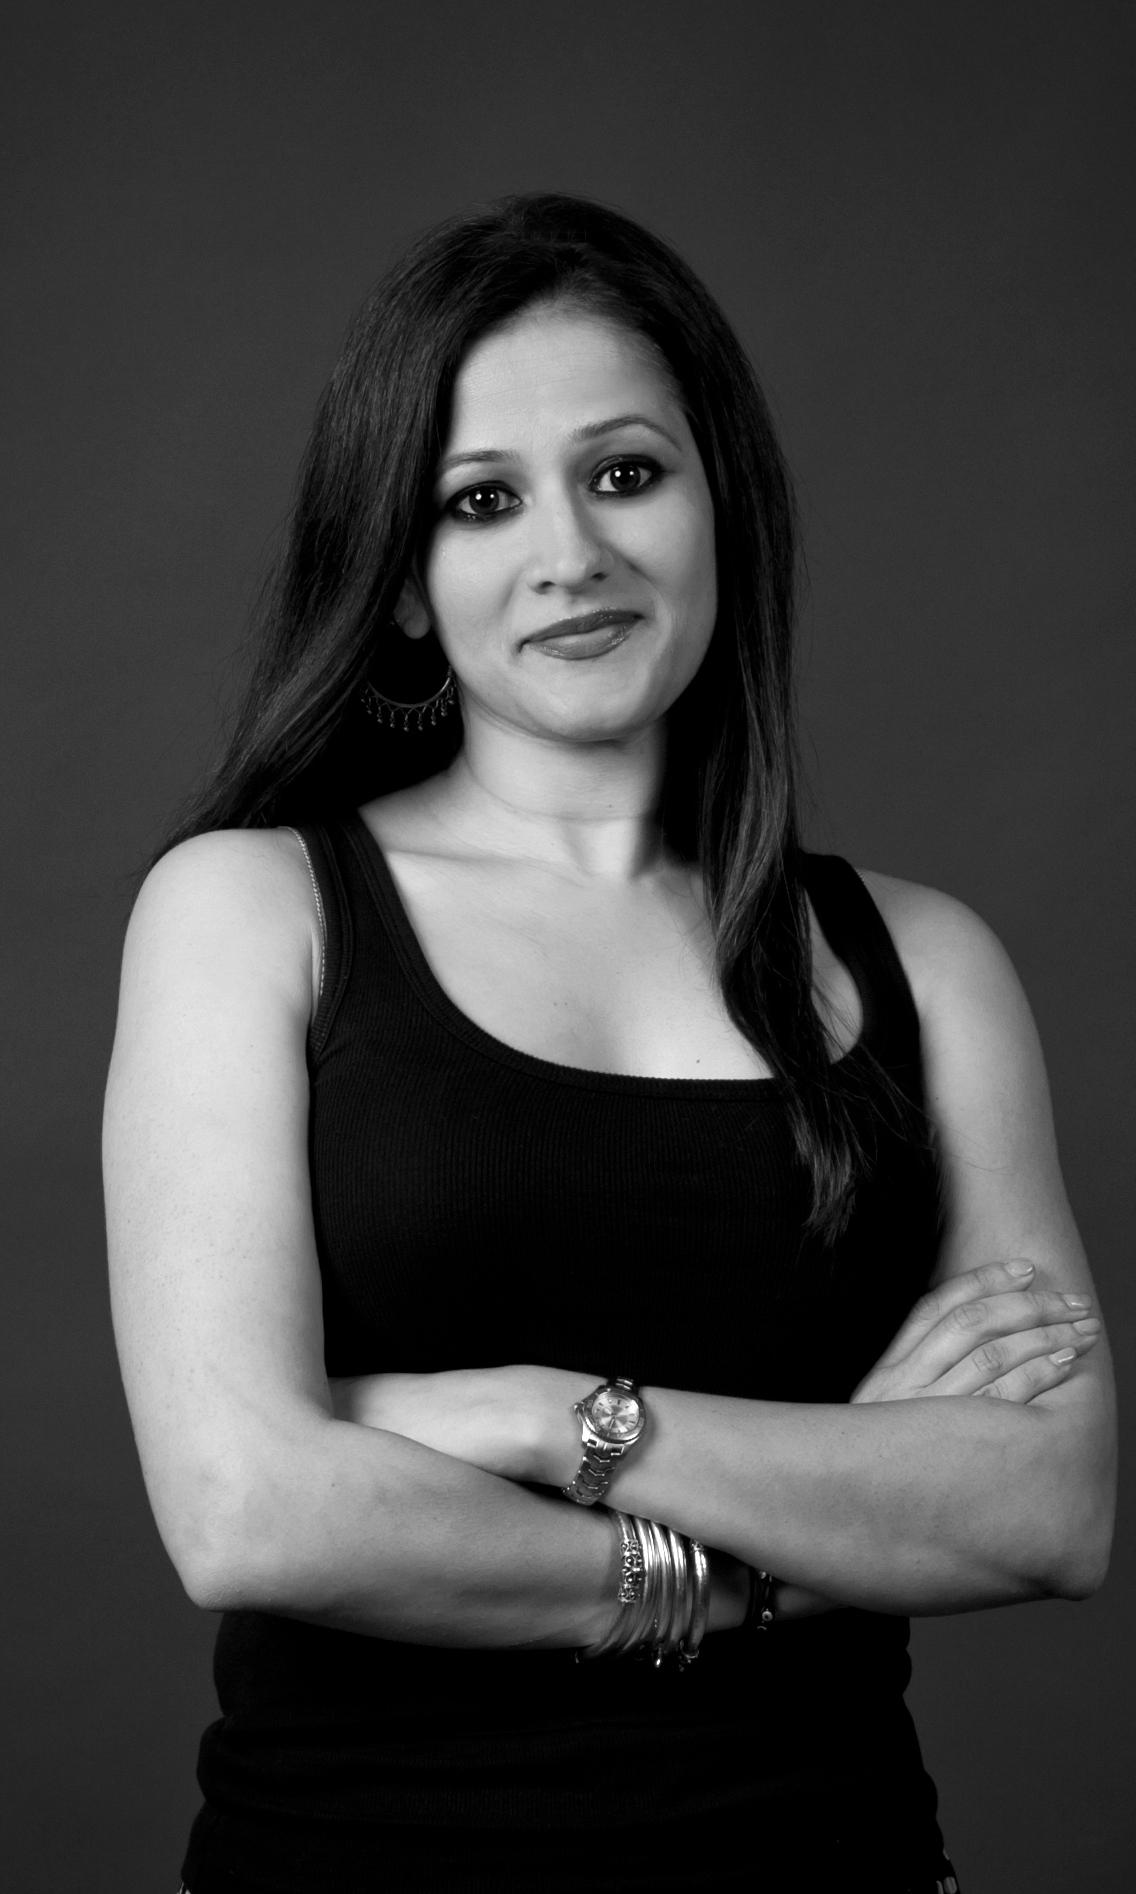 Sindu Singh - as Aruna & SubhadraSindu recently directed Vijay Tendulkar's Kanyadaan, Rahul Varma's Counter Offence, Girish Karnad's Wedding Album and Mahesh Dattani's Dance Like a Man. She has essayed multiple roles with various Bay Area theatre companies. Favorites include Malini in Anupama Chandrasekhar's Free Outgoing, Naina in Basab Pradhan's adaptation of Ibsen's A Doll's House, Damyanti in Mahesh Elkunchwar's Party, Bagheera in Harish Agastya's Mowgli and I, Sarita in Vijay Tendulkar's Kamla, and Hamida Begum in Asghar Wajahat's Jis Lahore Nahin Vekhya O Jammyai Nahin. She founded 'Rangmanch', a South Asian theater group for the Stanford University community, and for its maiden outing, directed Yoni ki Baat, the South Asian version of Eve Ensler's Vagina Monologues.Sindu is Founder and Co-Artistic Director of Bay Area Drama Company.PC: Ashima Yadava